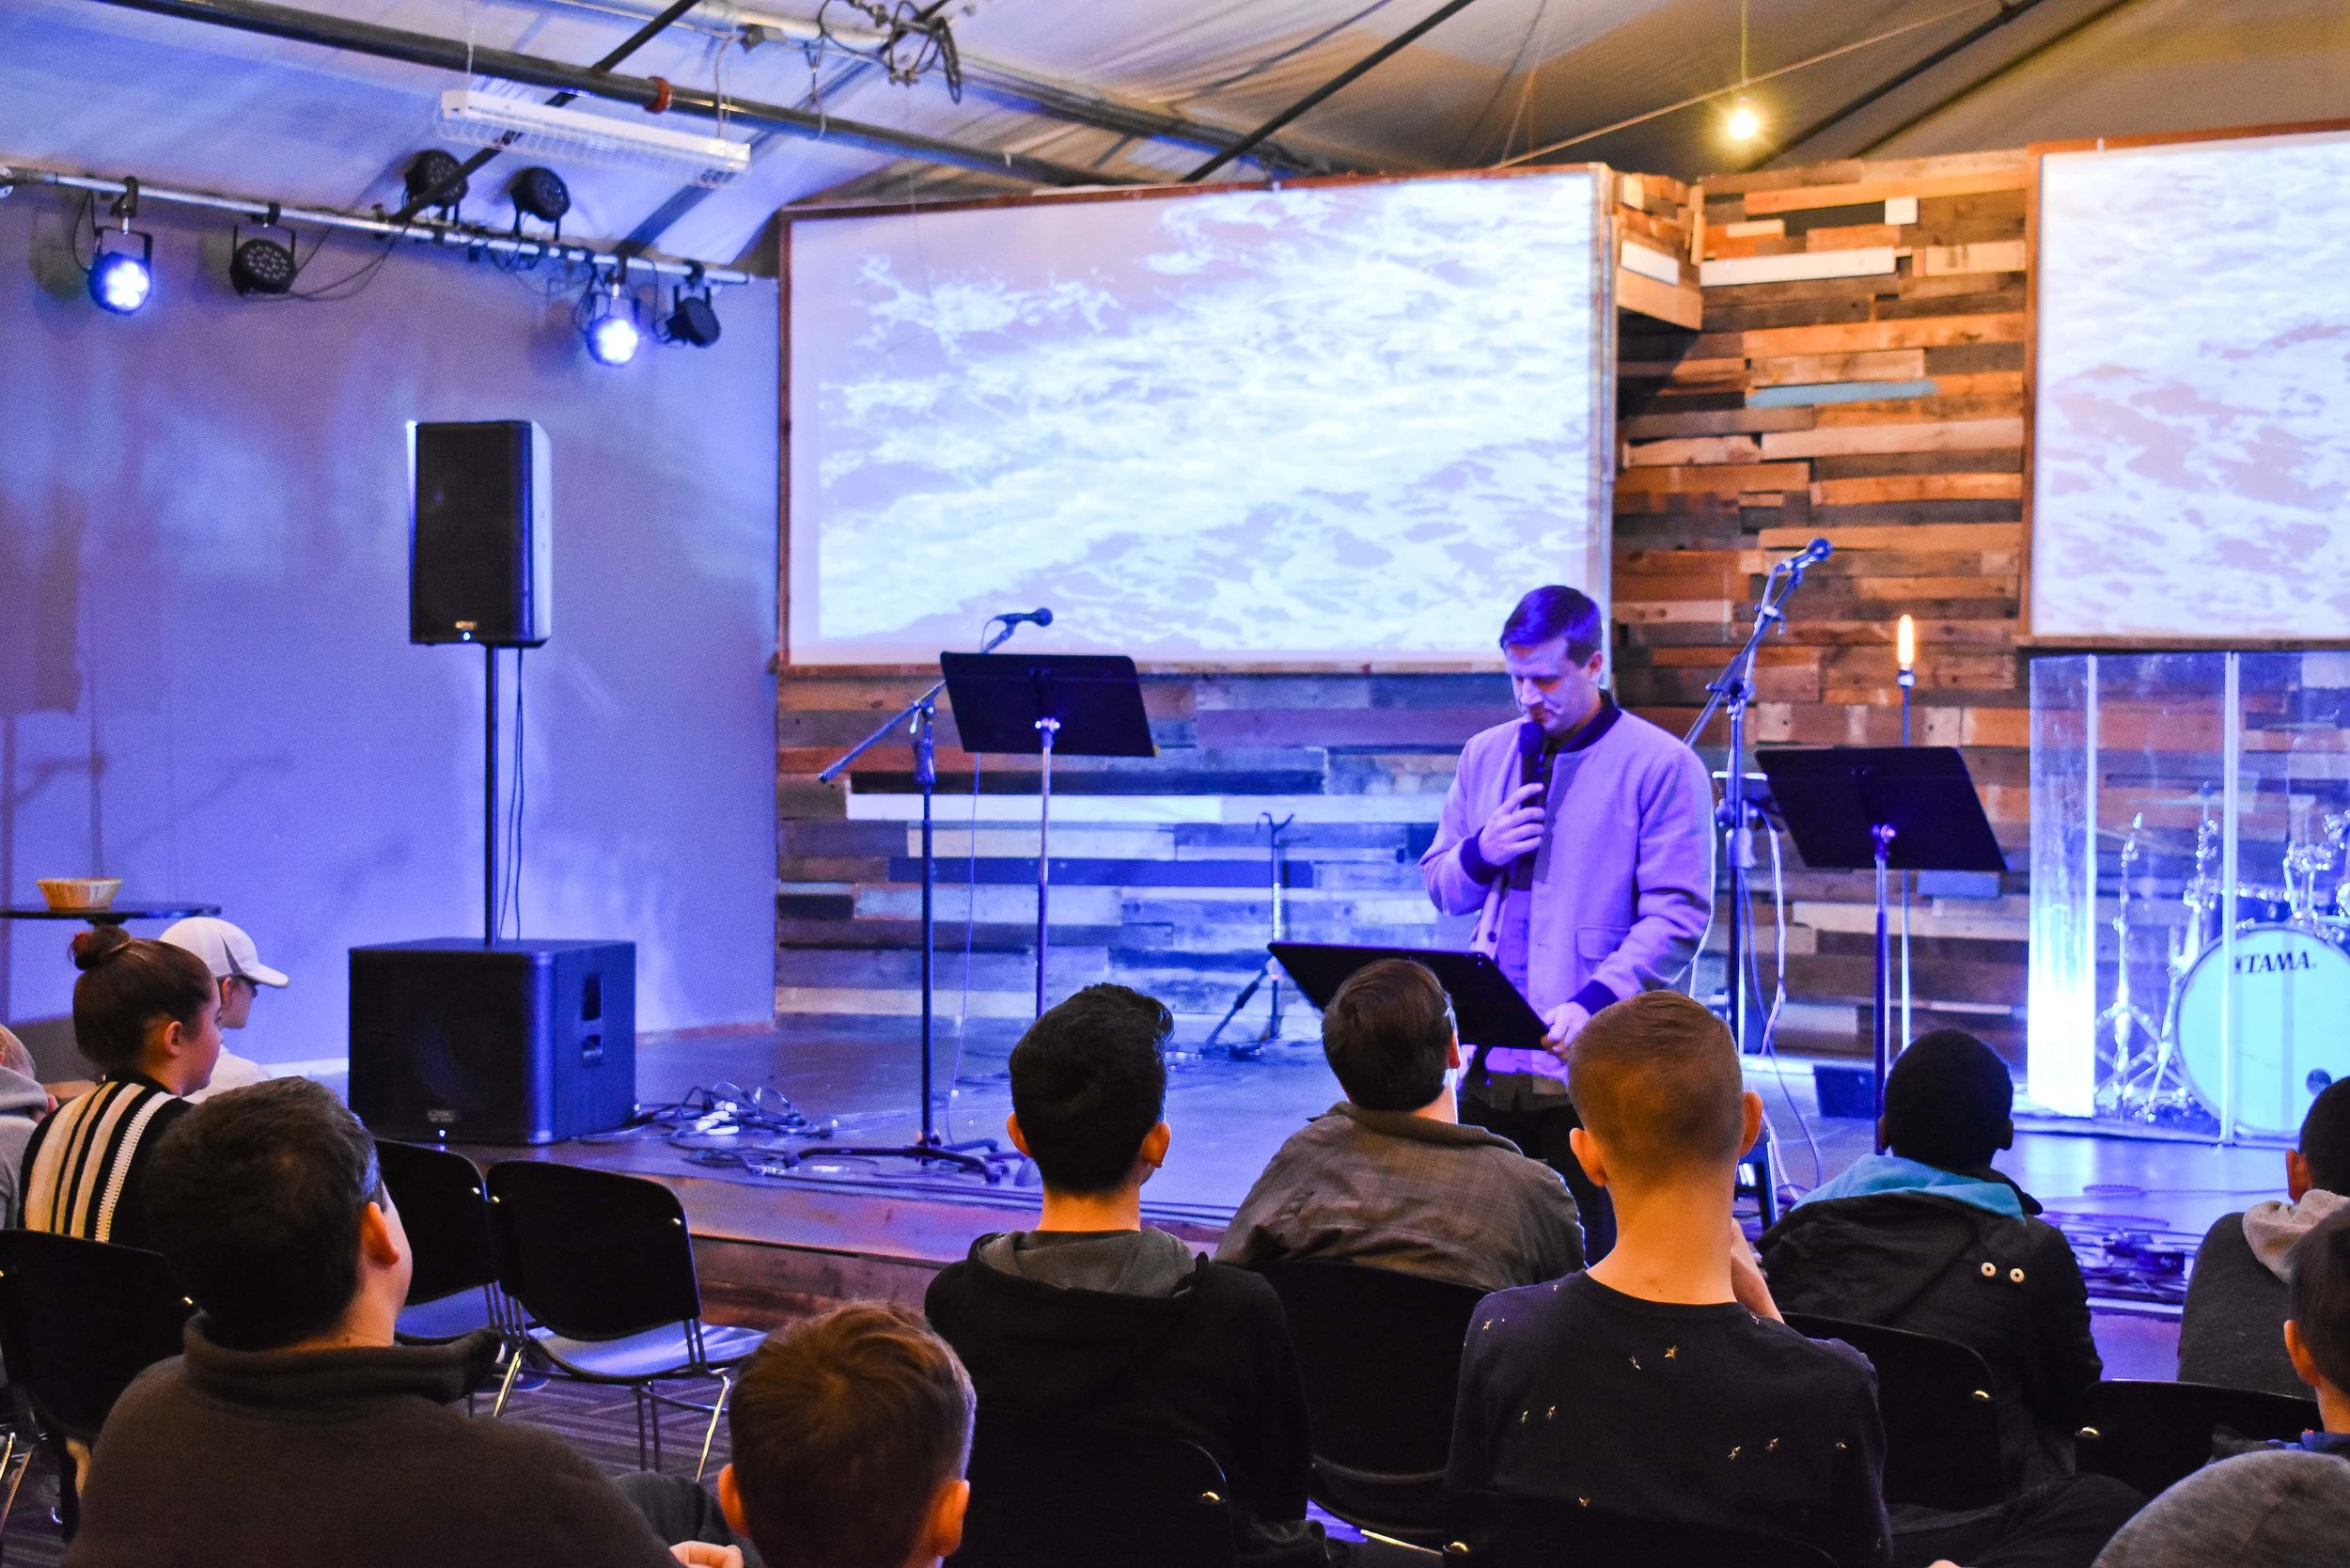 Mid Week at Christ Community Church